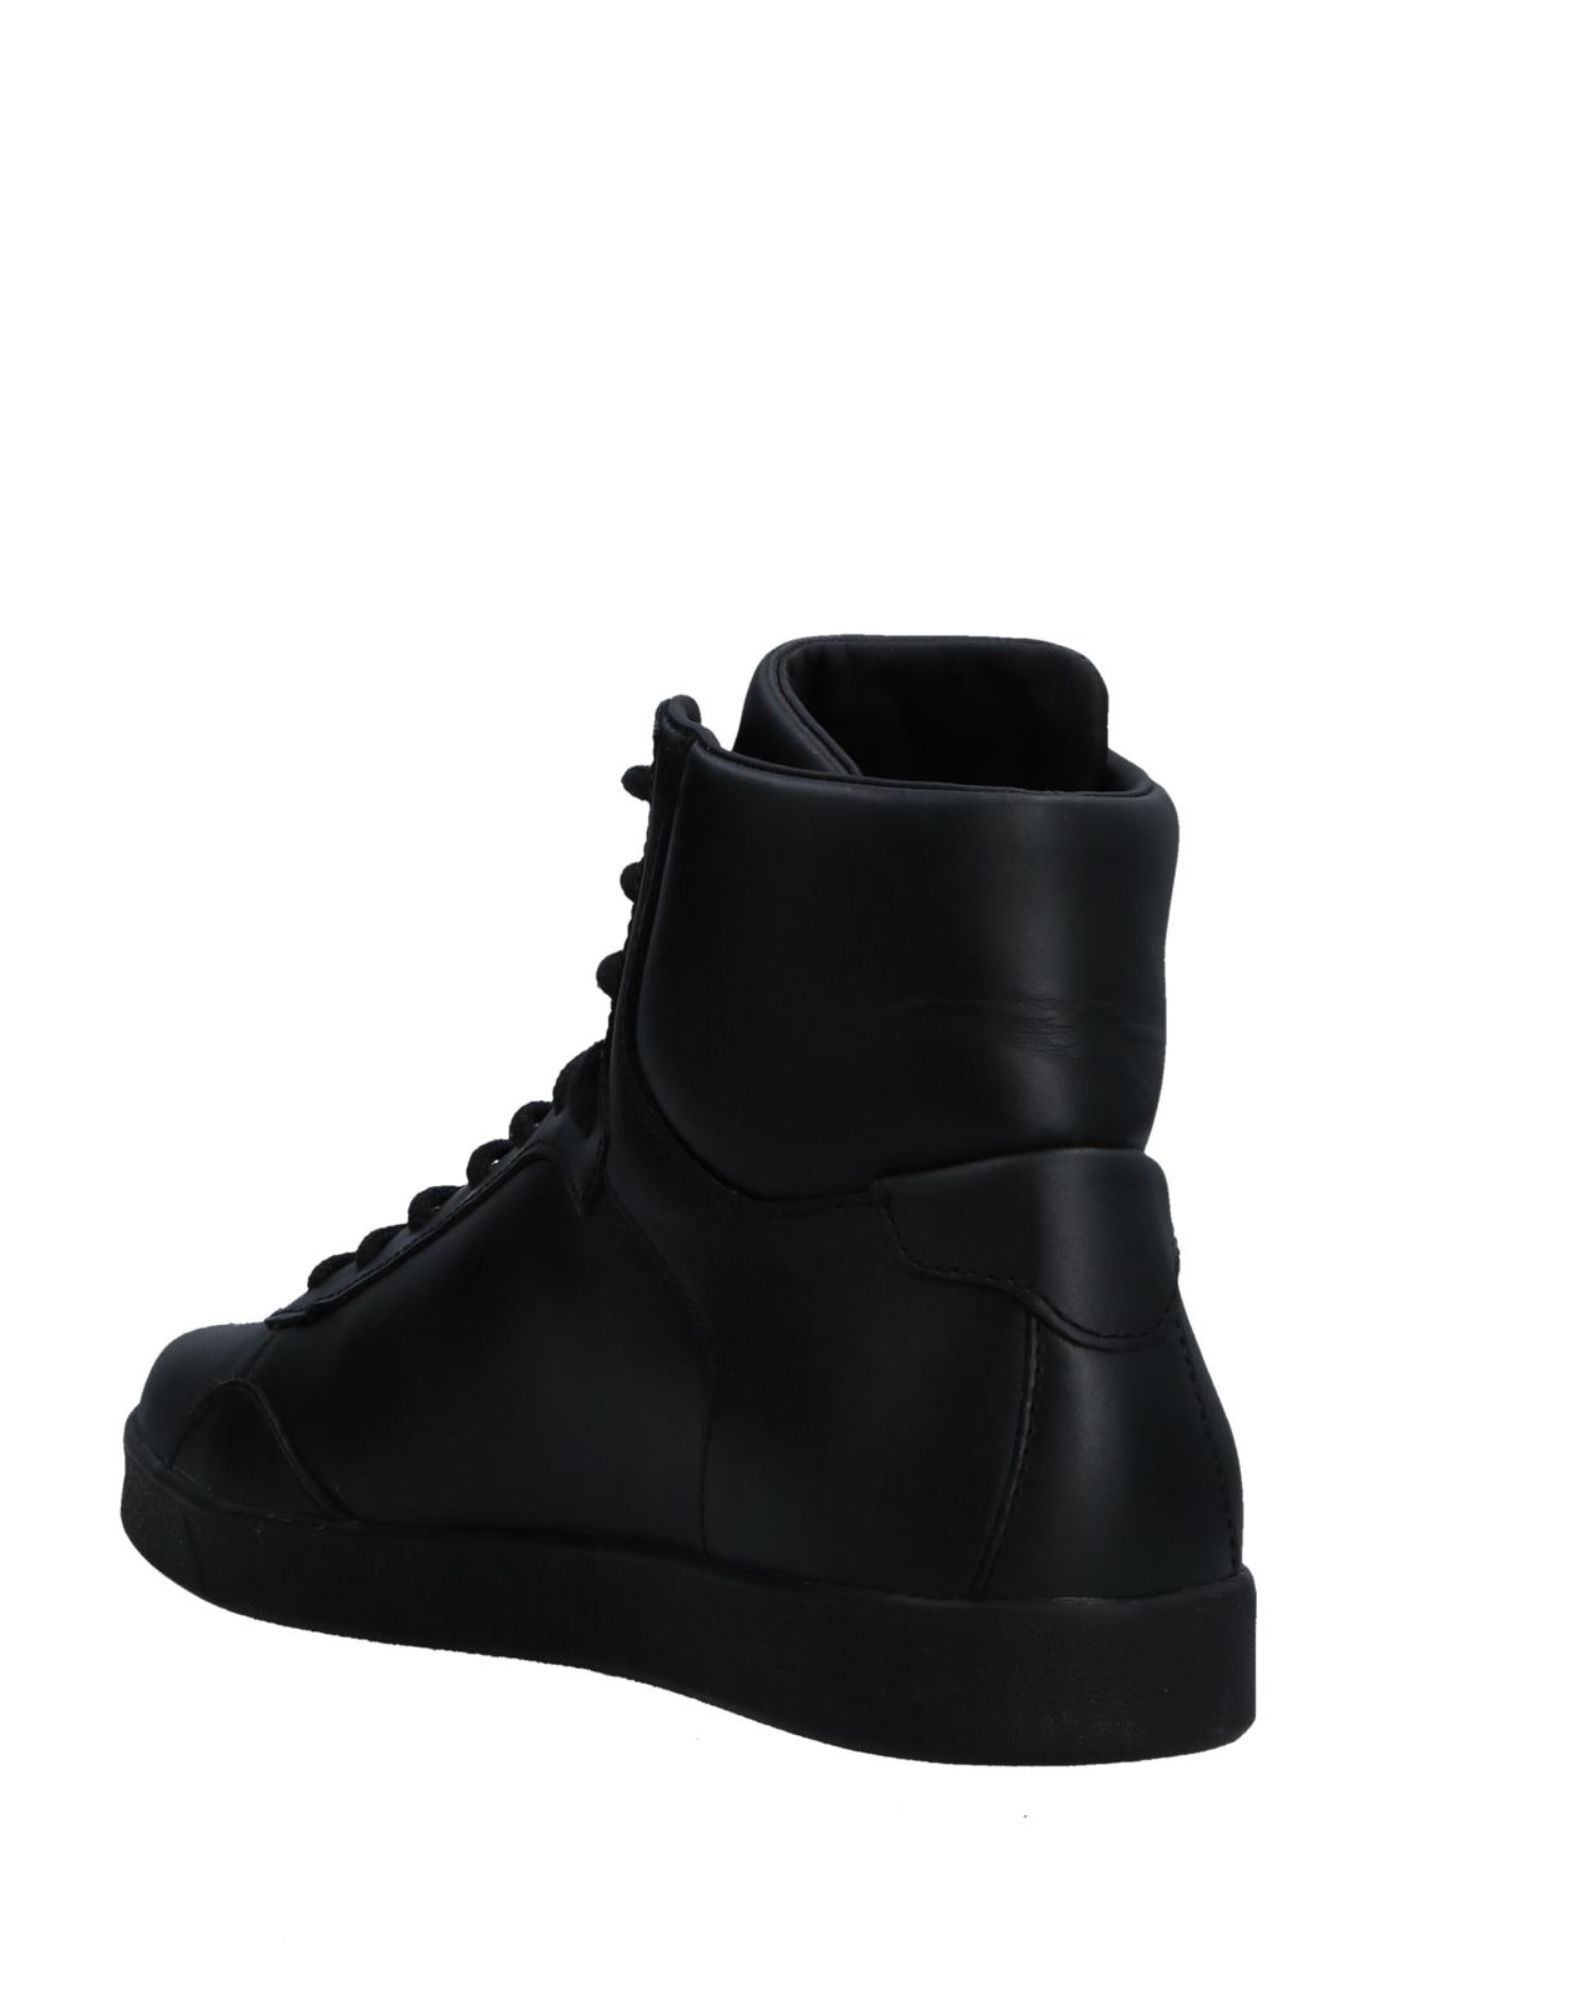 Armani Jeans Gute Sneakers Herren  11524600HK Gute Jeans Qualität beliebte Schuhe 13433f